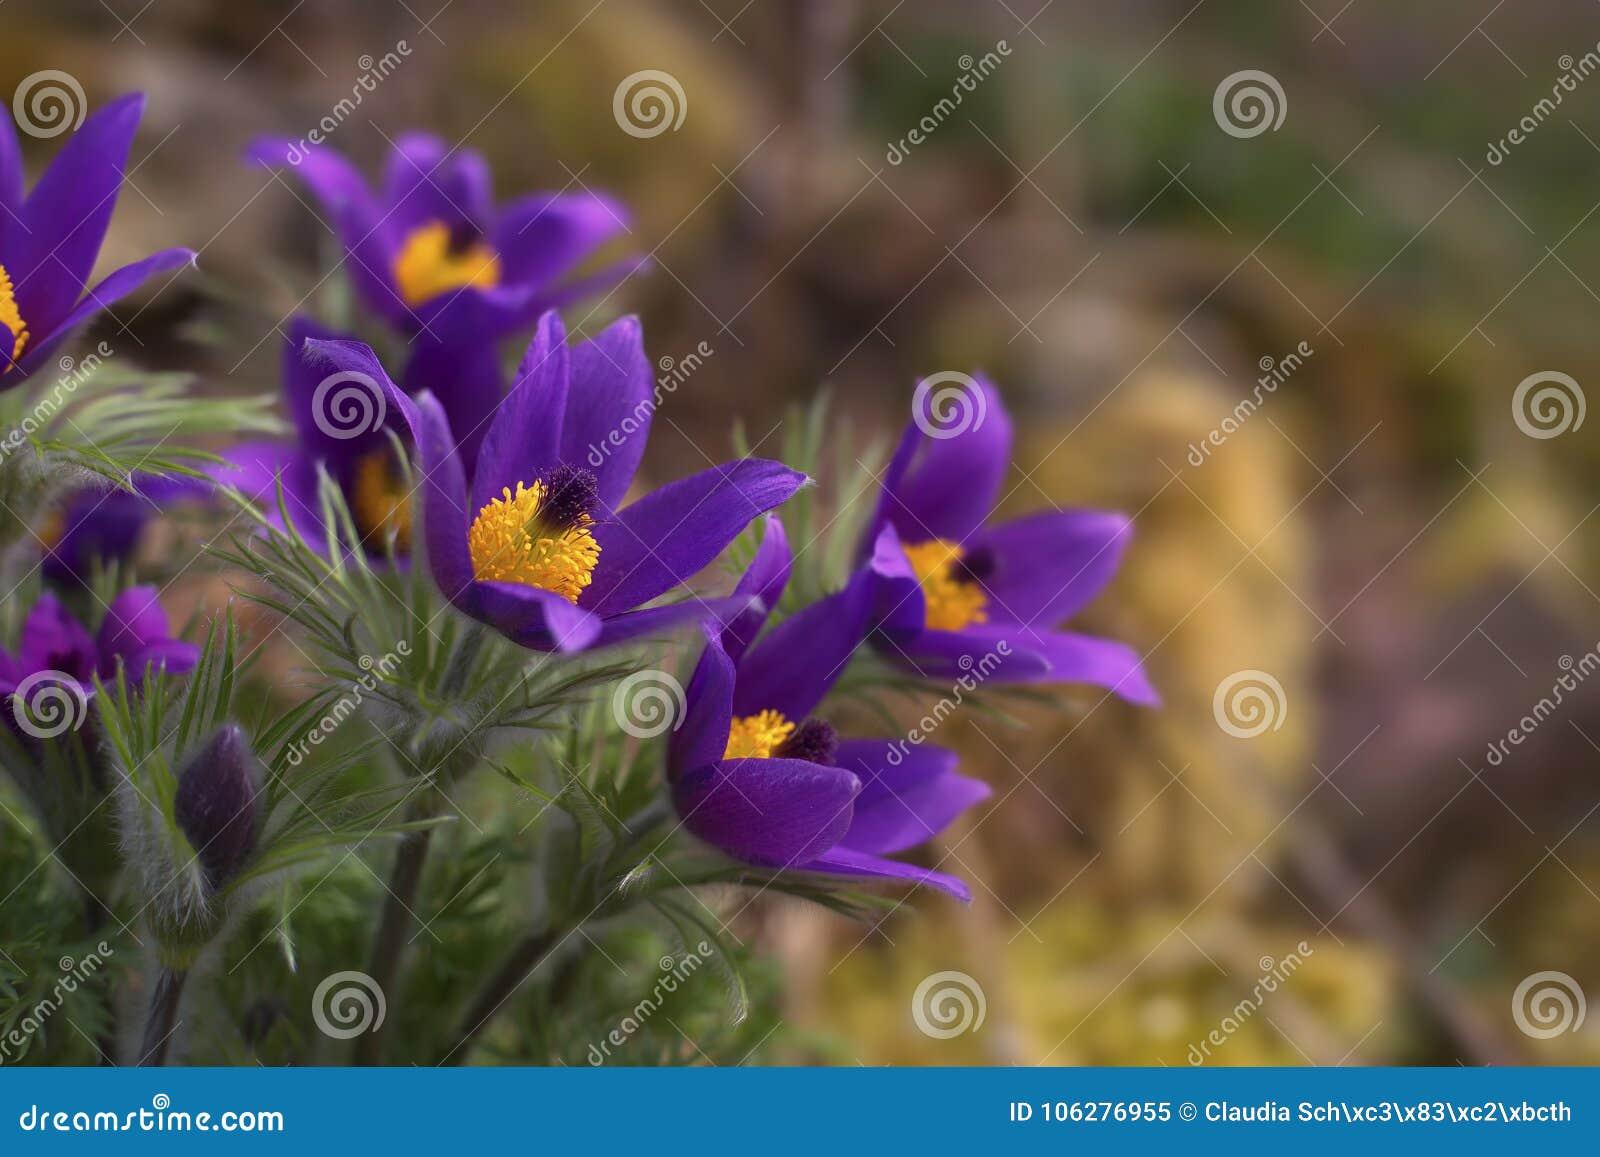 Pasque flower bunch Pulsatilla vulgaris